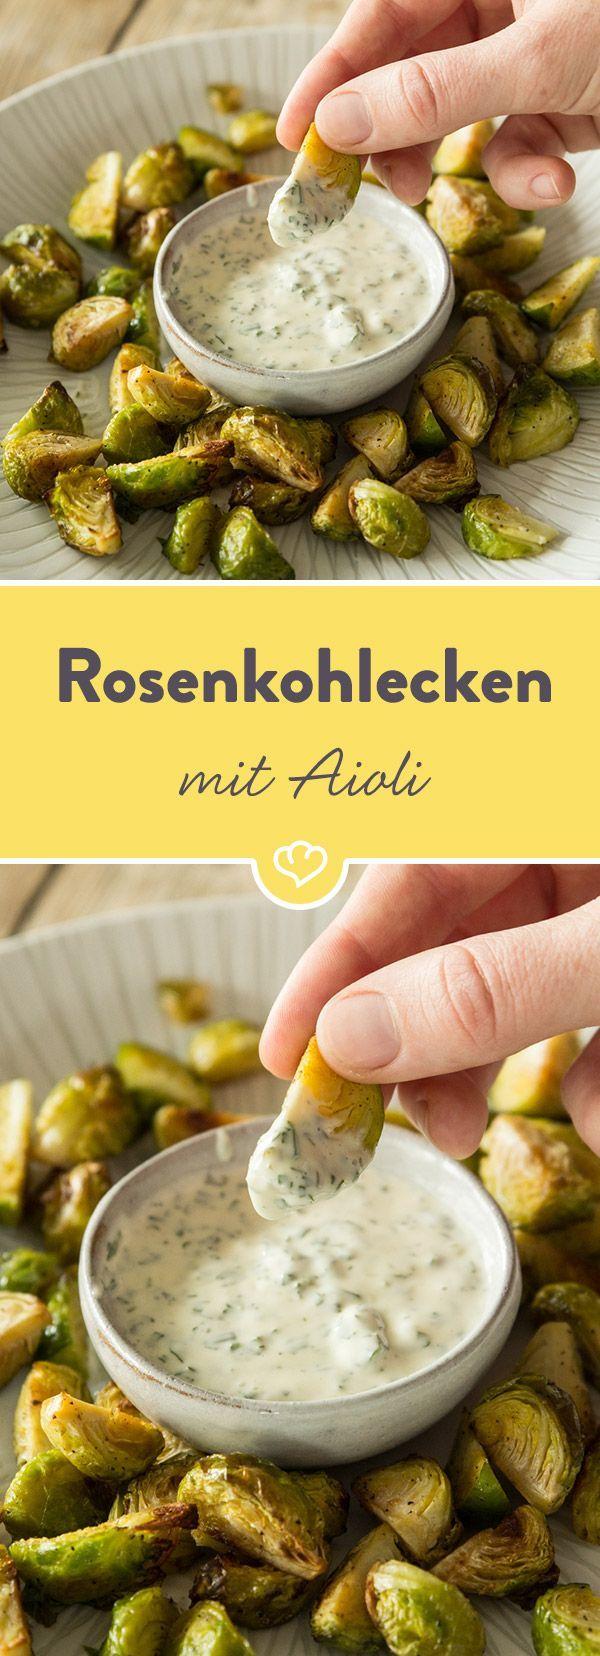 Rosenkohleecken mit Aioli   – Gesunde Snacks